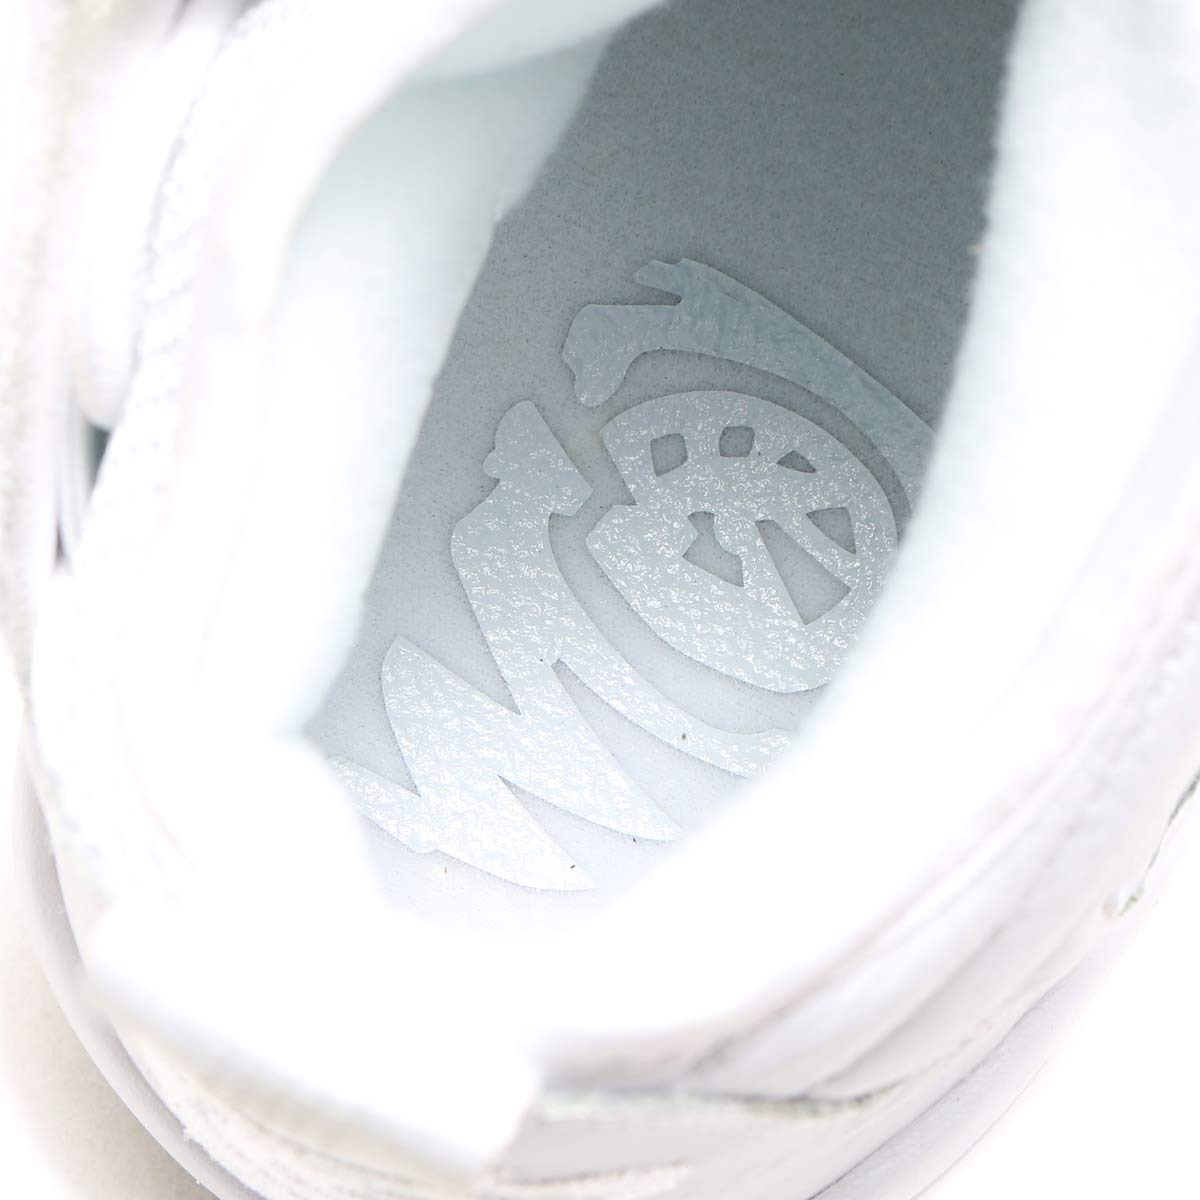 NIKE AIR SHAKE NDESTRUKTナイキ エア シェイク インデストラクトWHITE WHITE WHITE メンズ レディース スニーカー 17FA SdBhtQxsCr